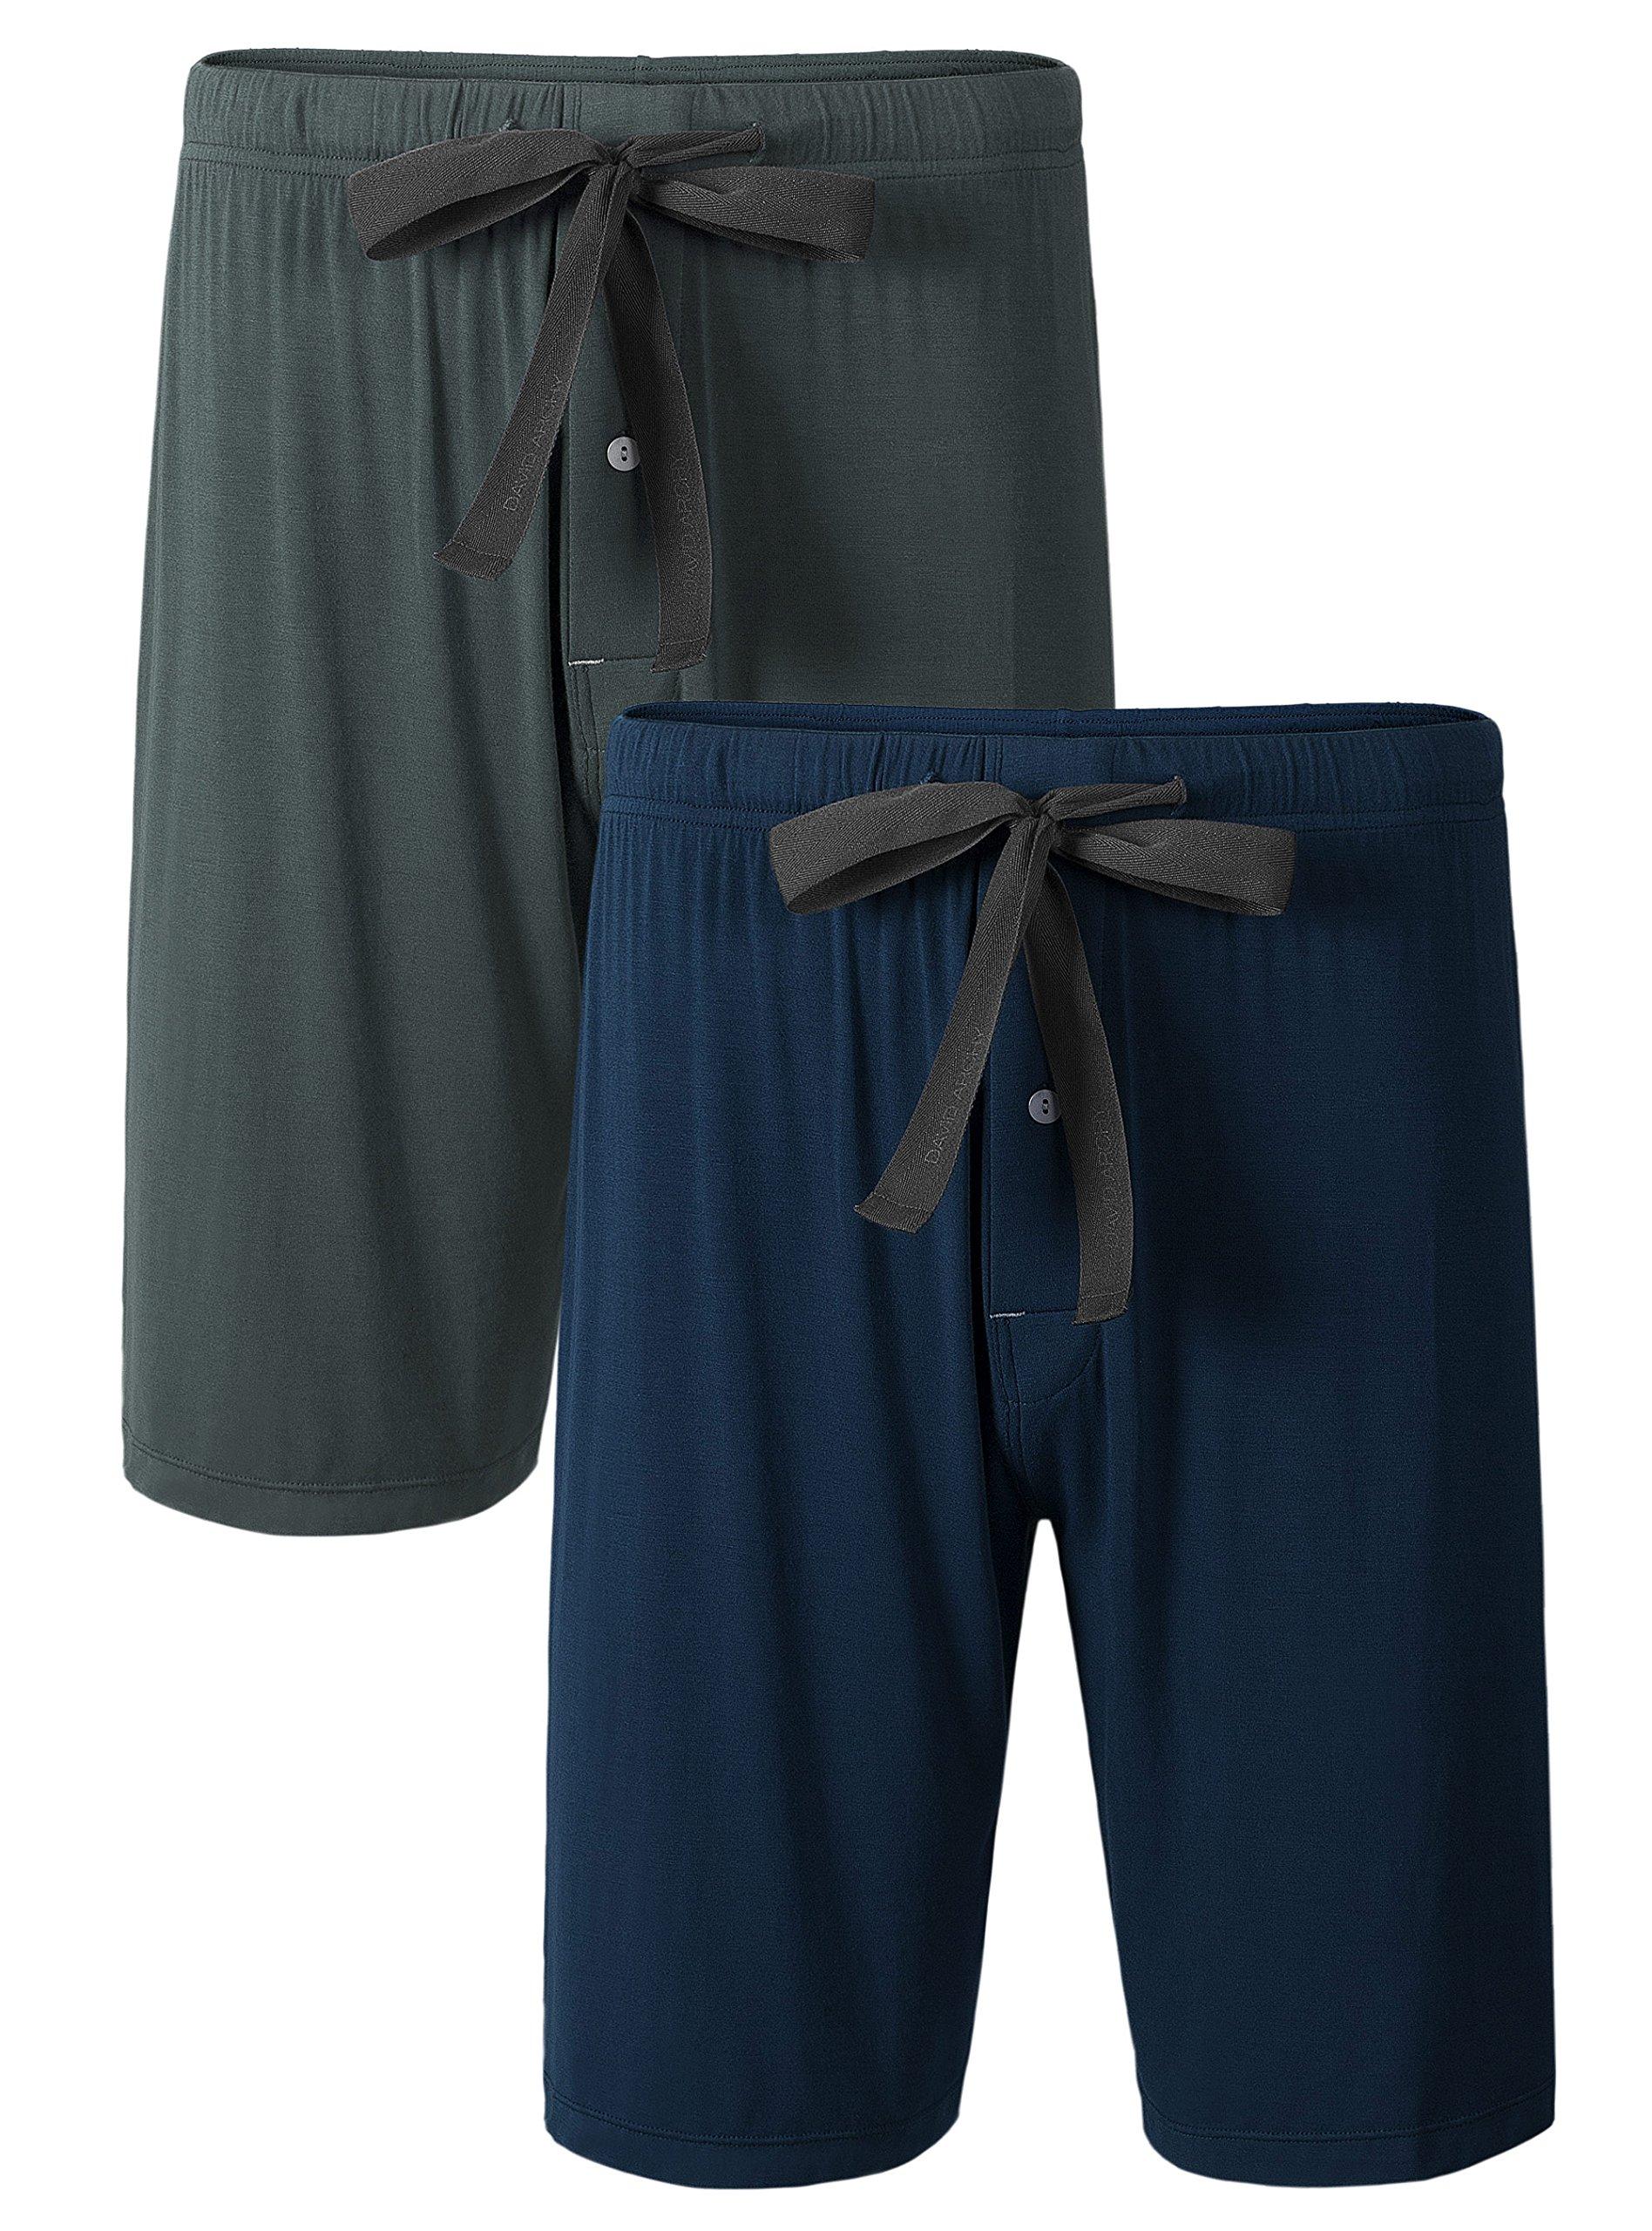 David Archy Men's 2 Pack Soft Comfy Bamboo Rayon Sleep Shorts Lounge Wear Pajama Pants (XL, Dark Gray+Navy Blue)